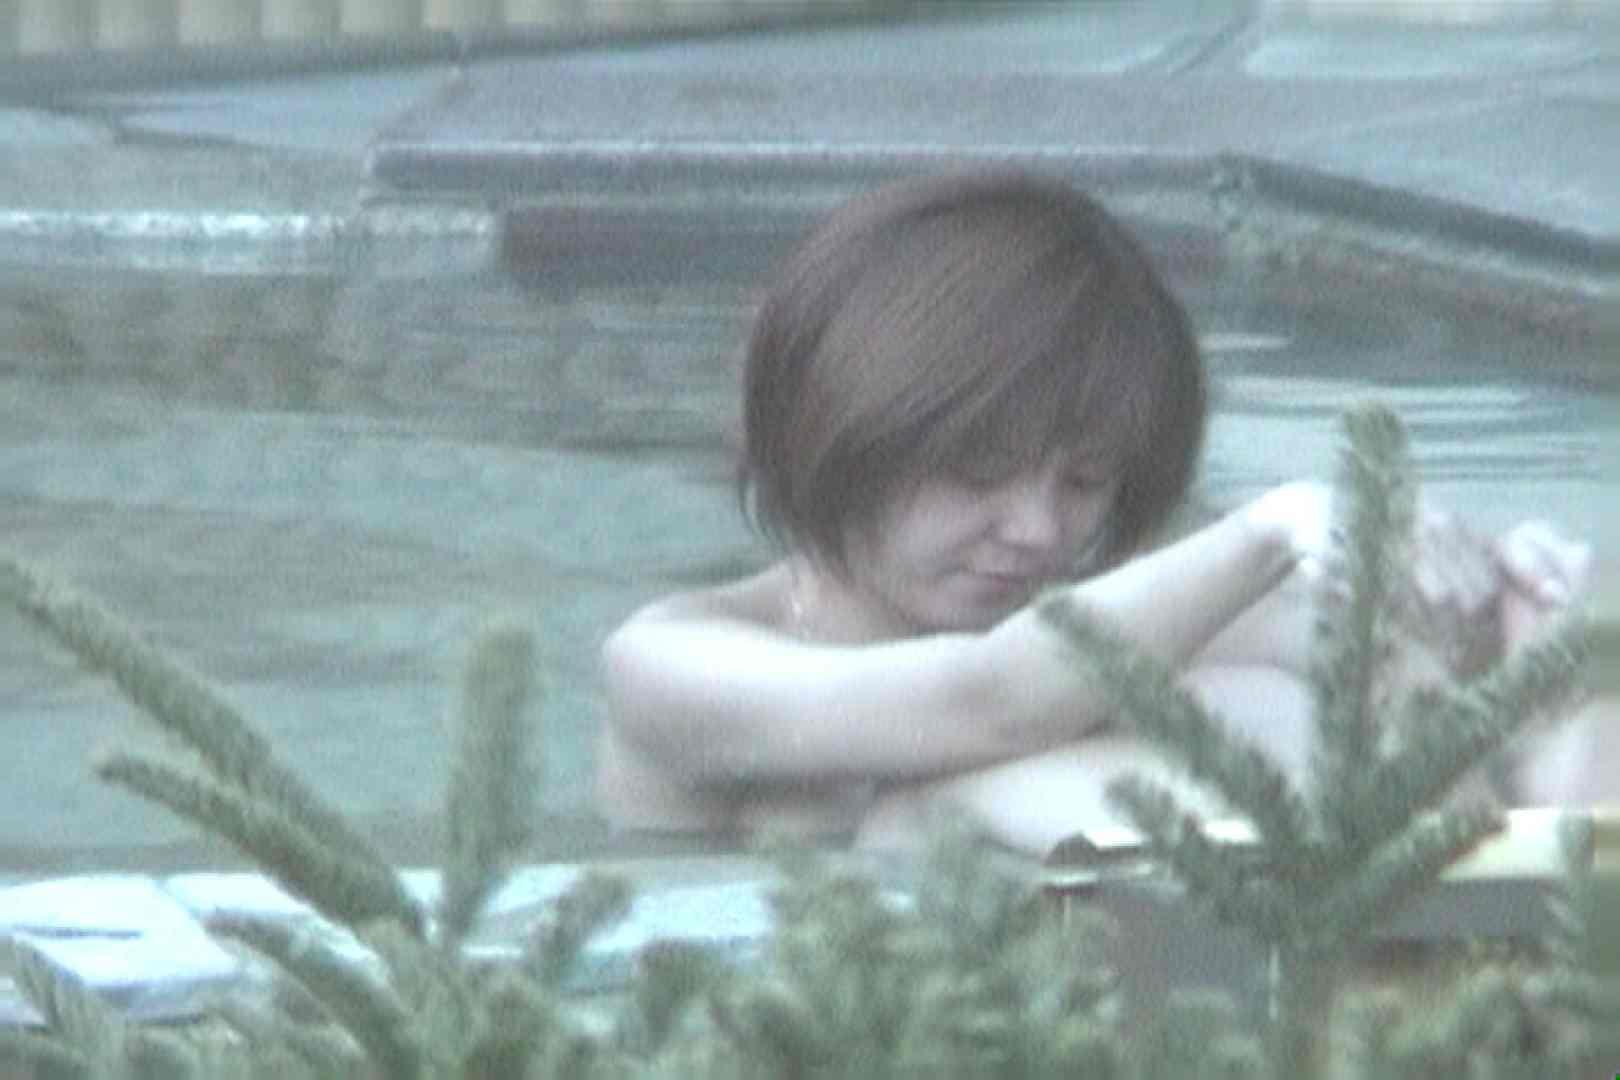 Aquaな露天風呂Vol.560 露天 | HなOL  62pic 4